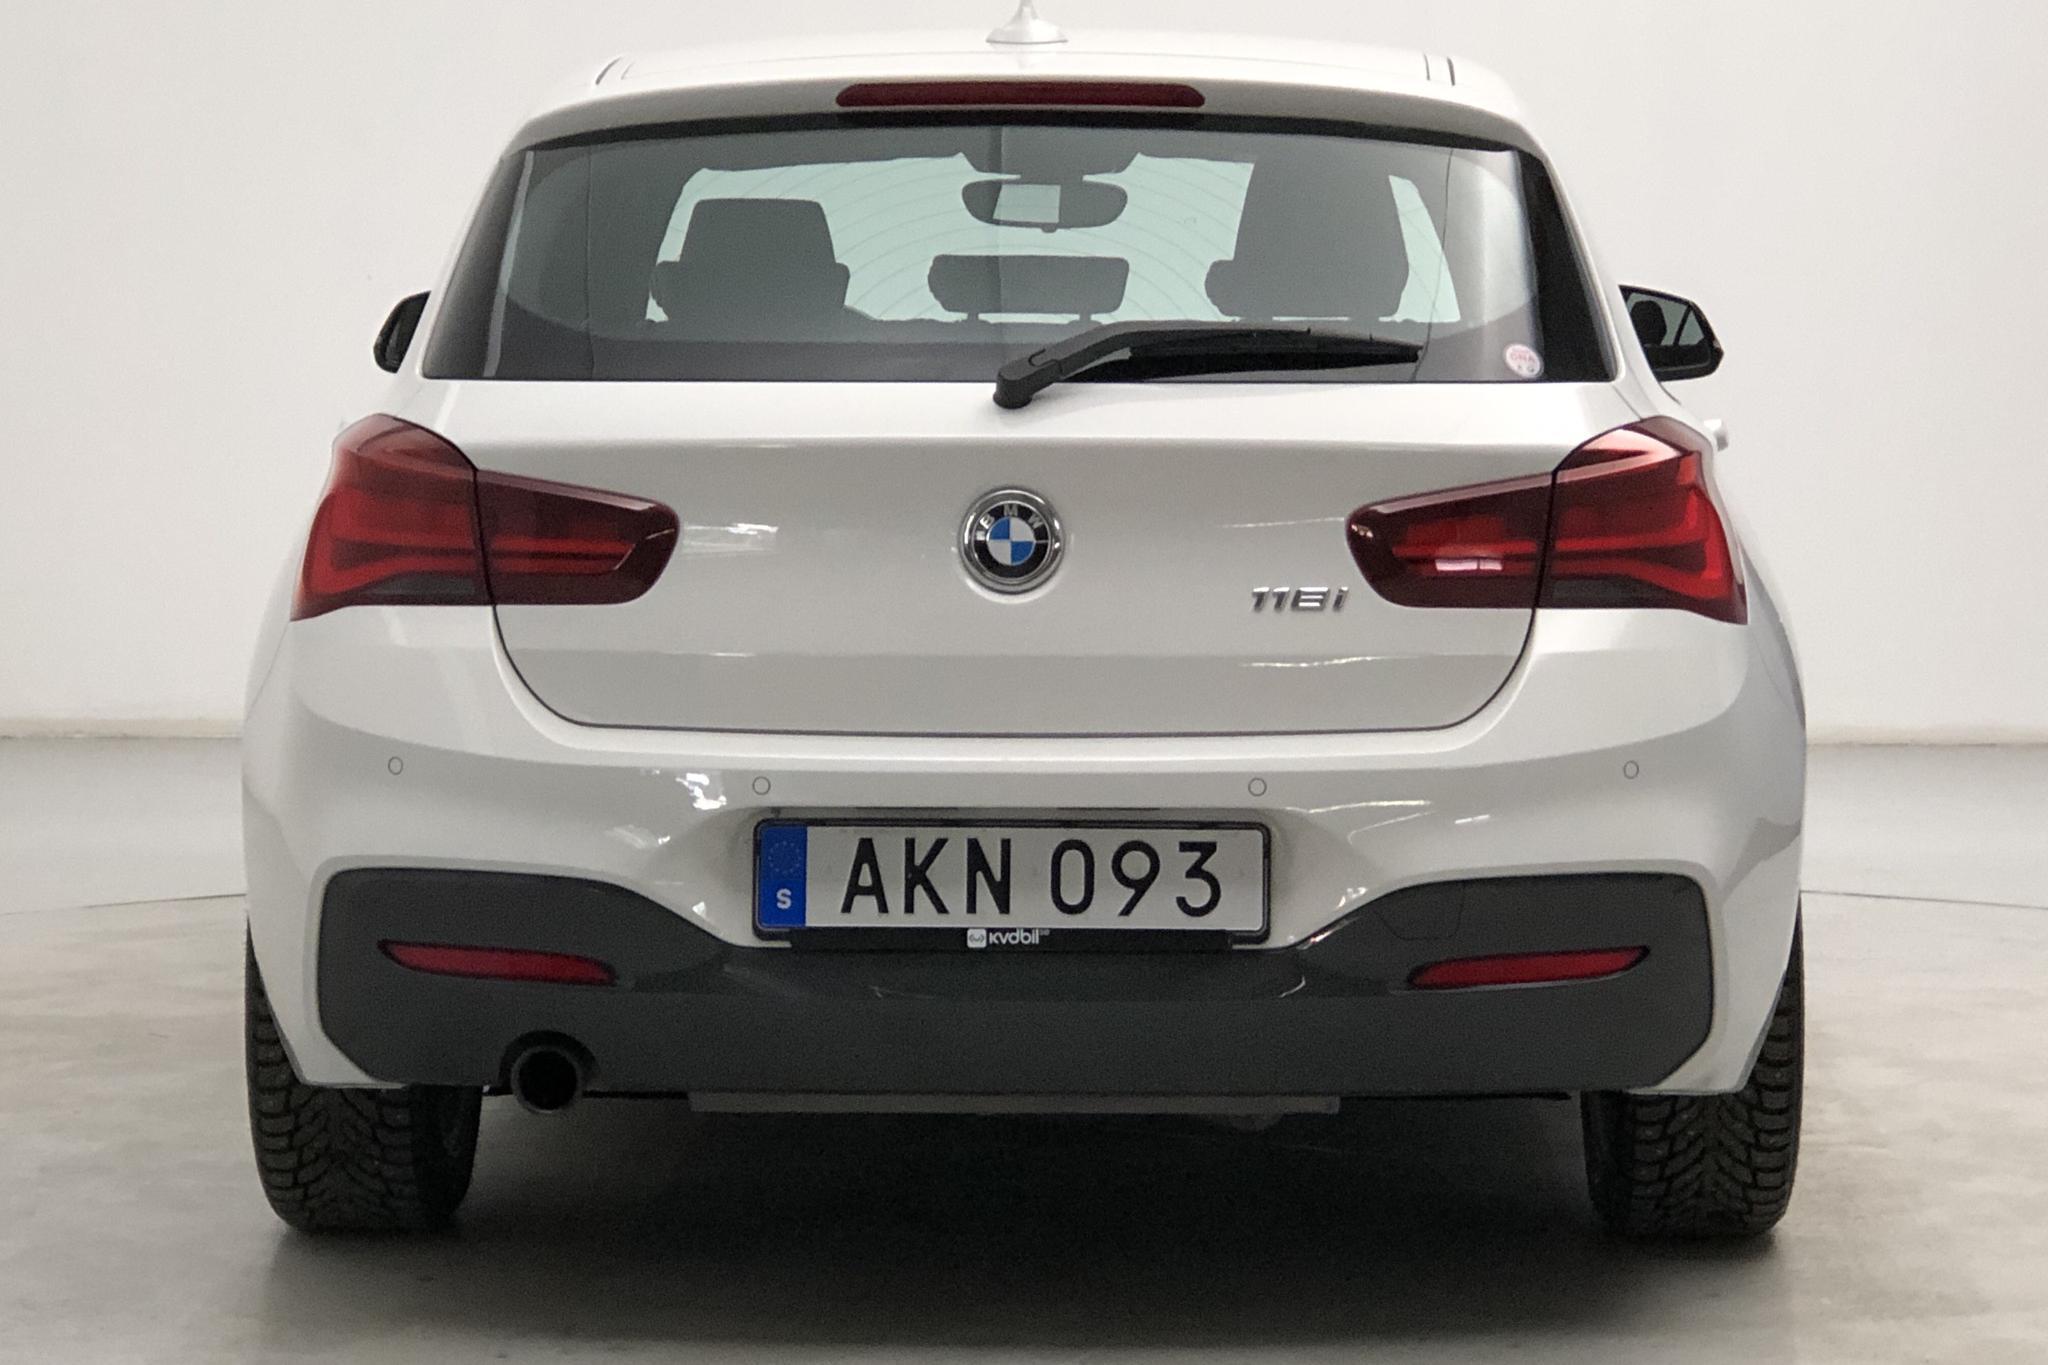 BMW 118i 5dr, F20 (136hk) - 22 390 km - Manual - white - 2019